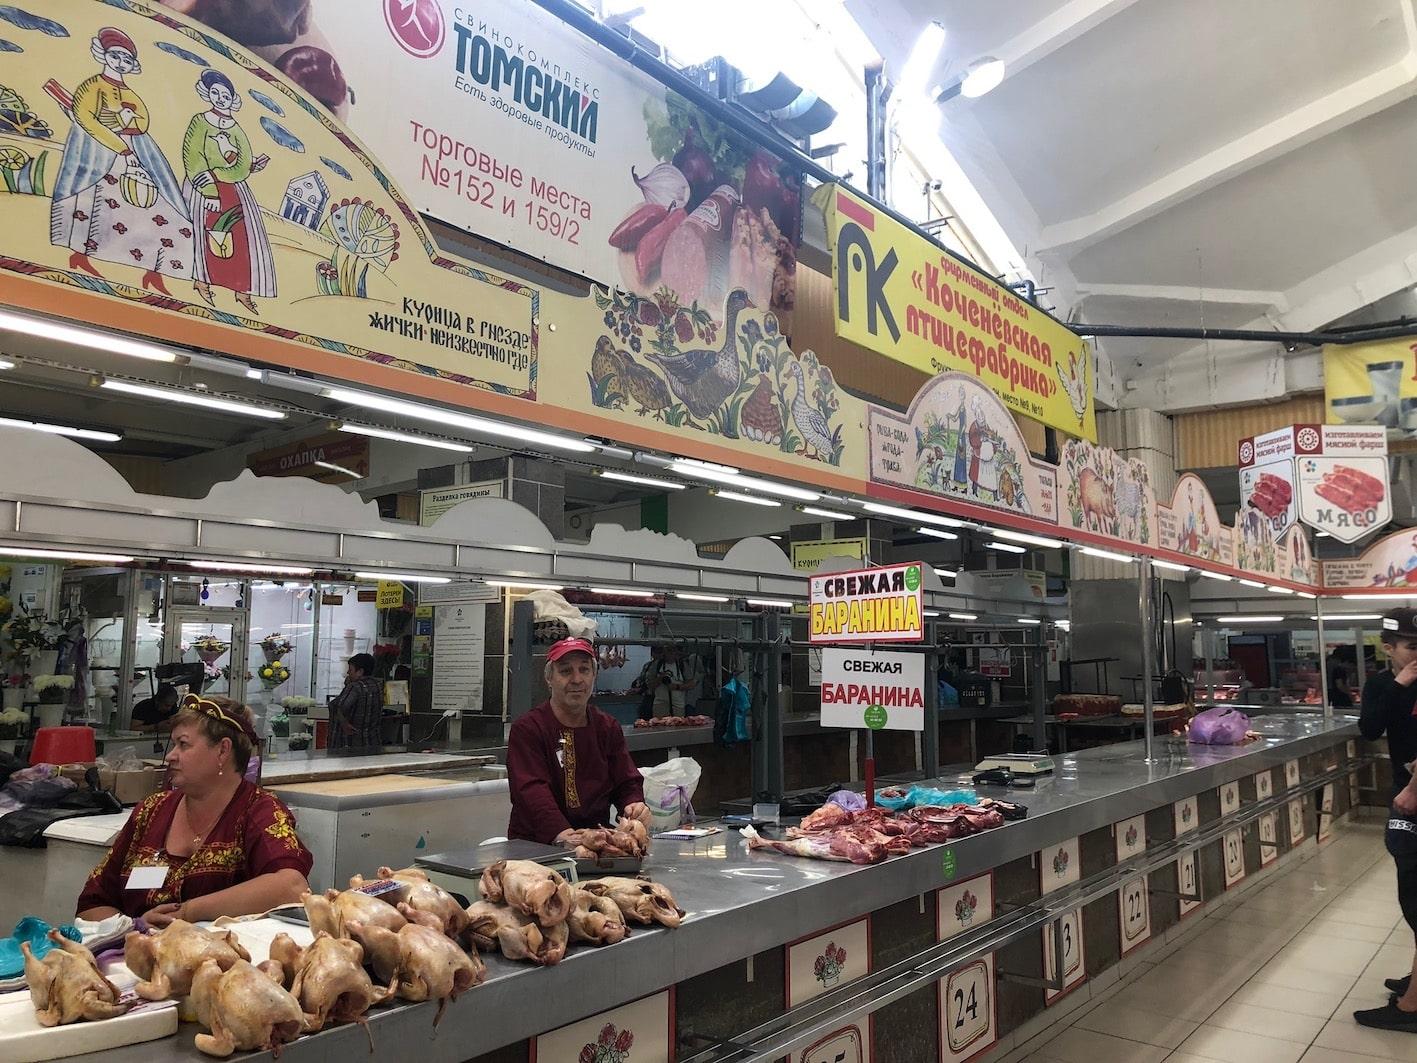 Meat_central market